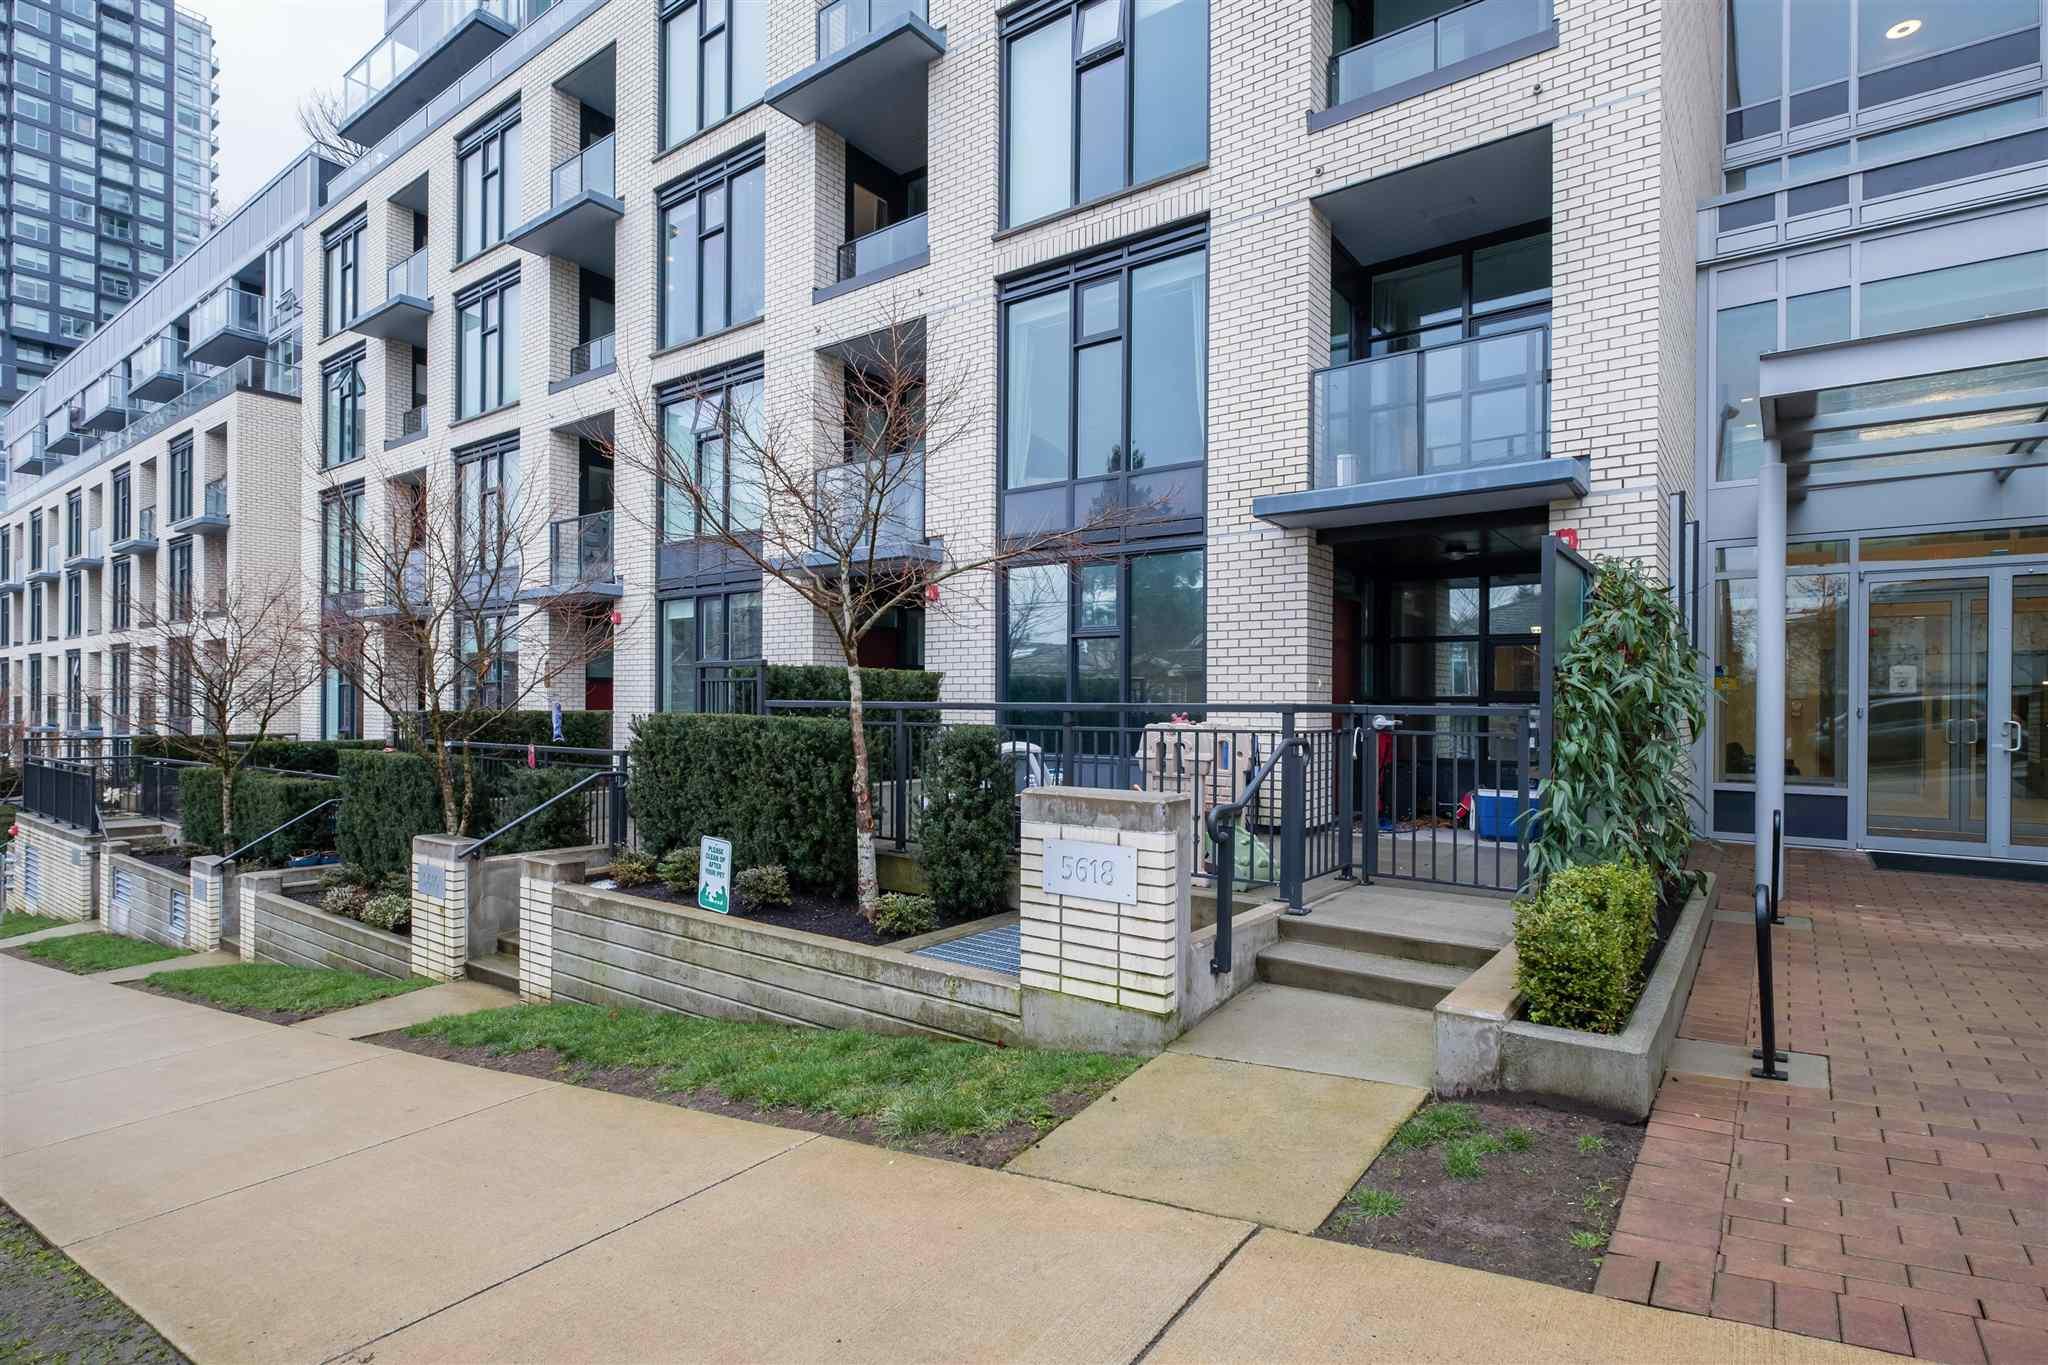 5618 ORMIDALE STREET - Collingwood VE Townhouse for sale, 3 Bedrooms (R2602561) - #1